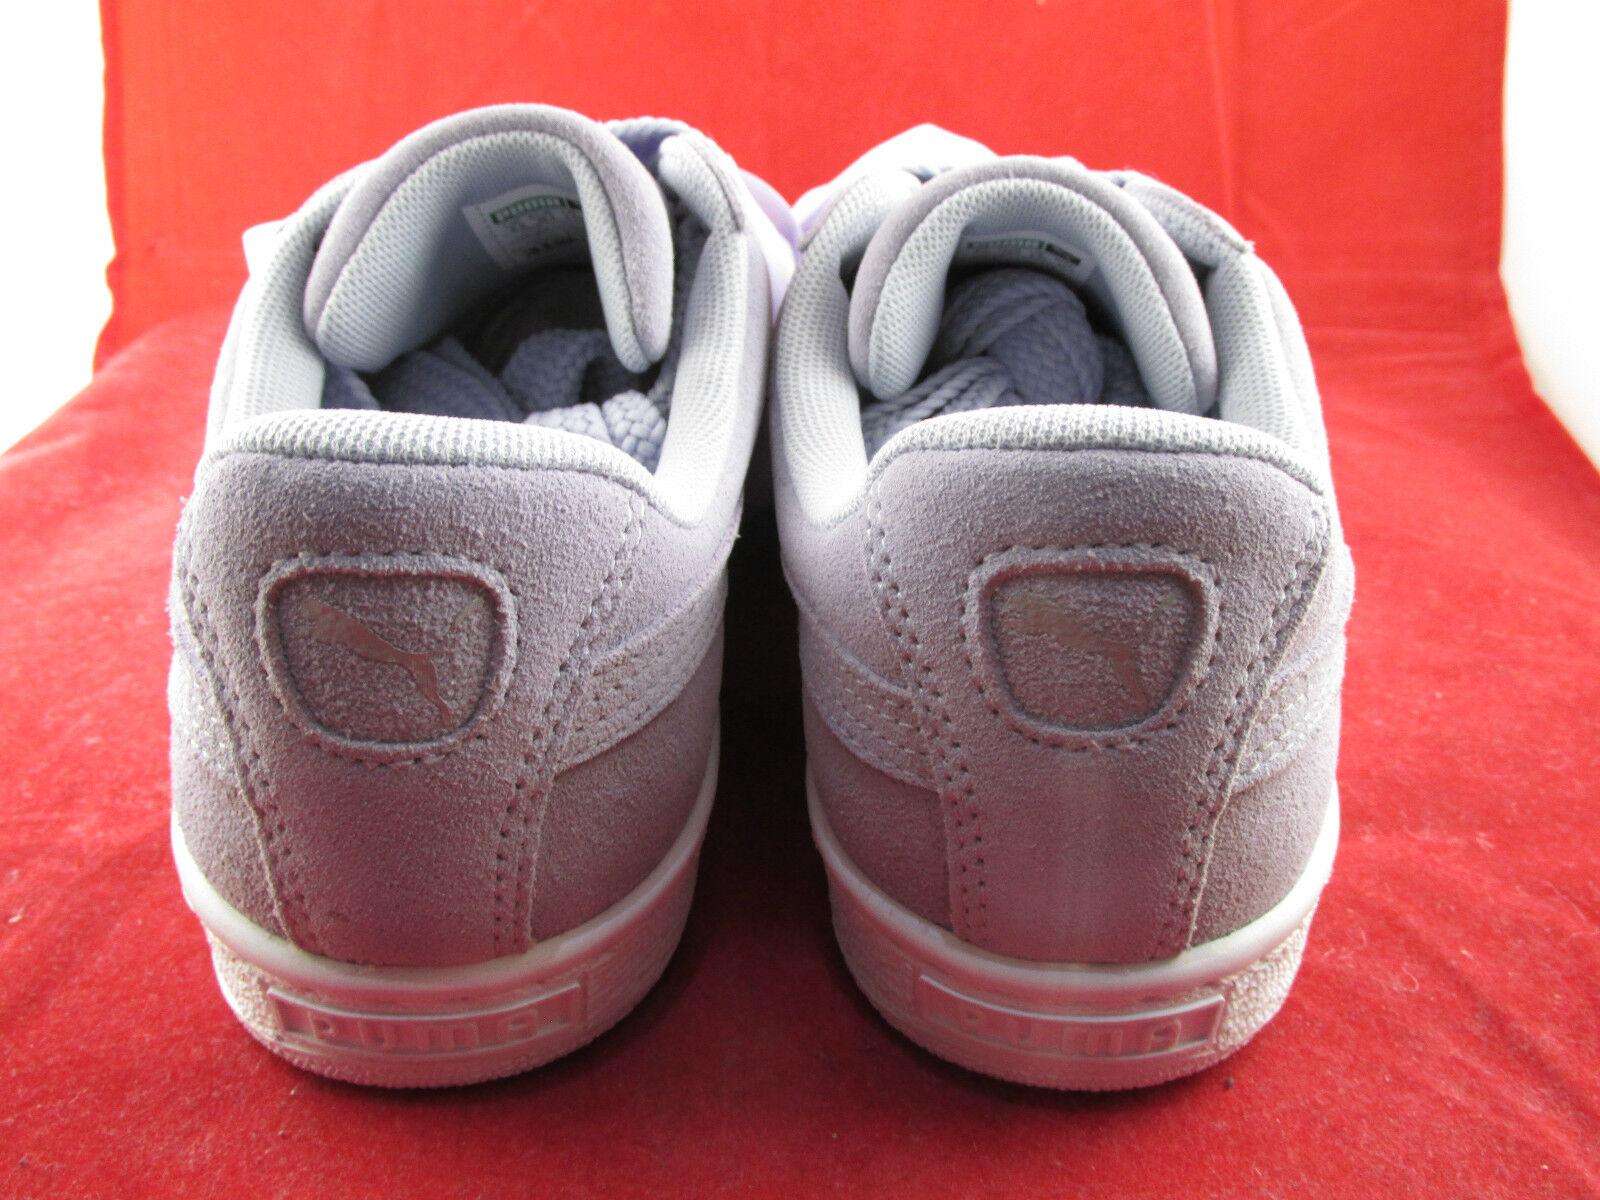 Puma Basket Heart Suede Jr Halogen Blau Lilac 3 365009-06 4 5 6 SportsLocker 365009-06 3 53220a